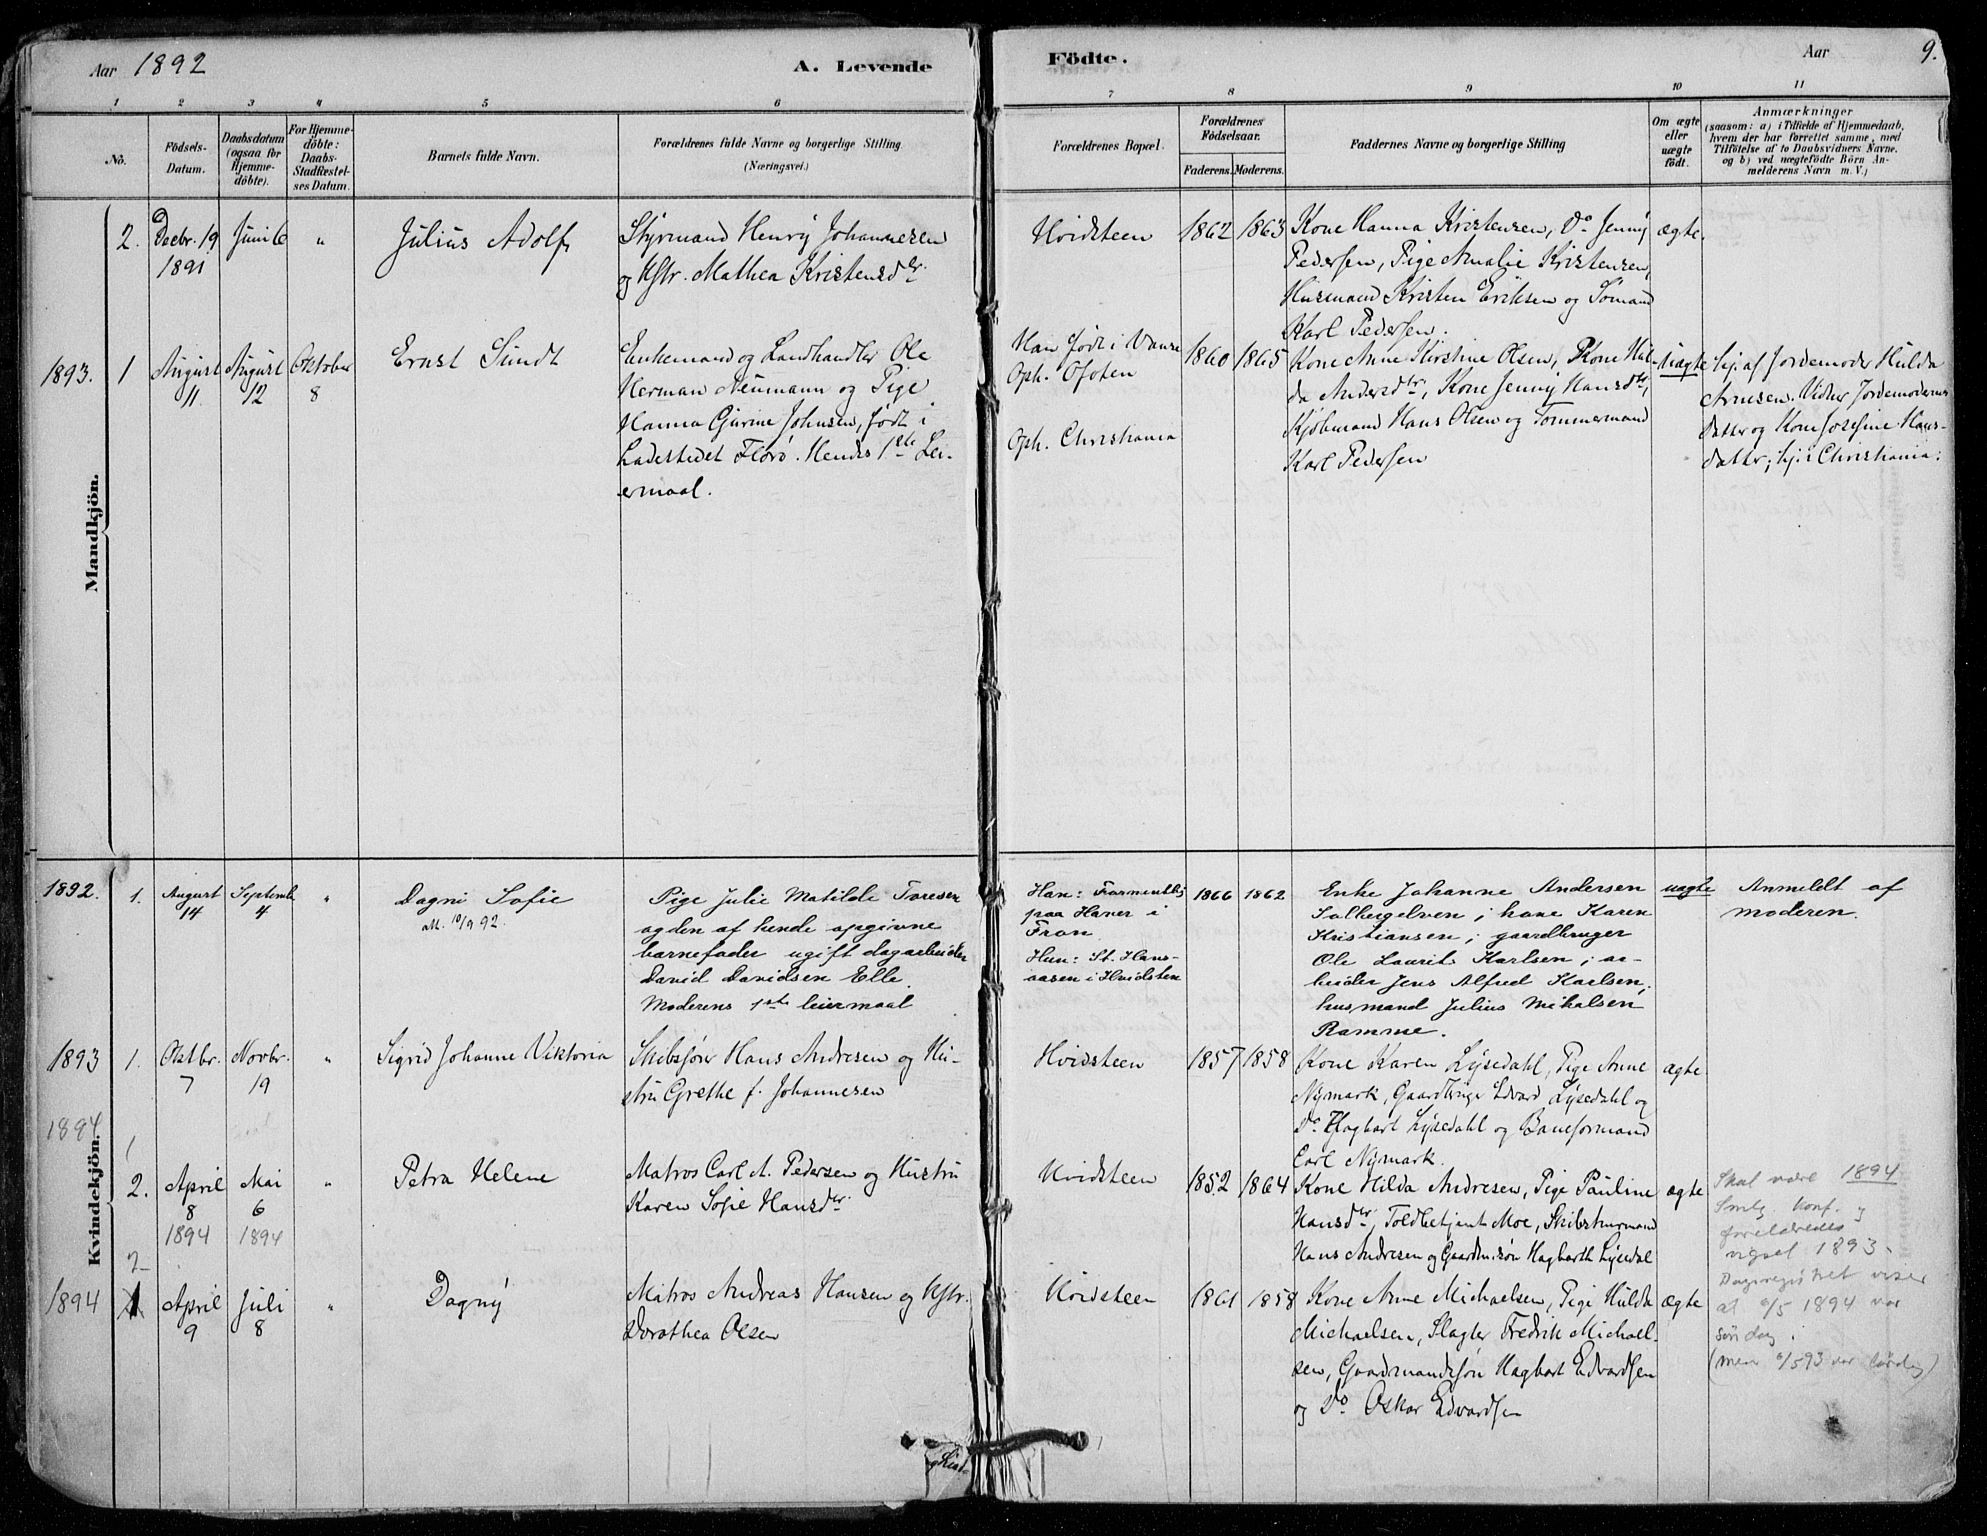 SAO, Vestby prestekontor Kirkebøker, F/Fd/L0001: Ministerialbok nr. IV 1, 1878-1945, s. 9